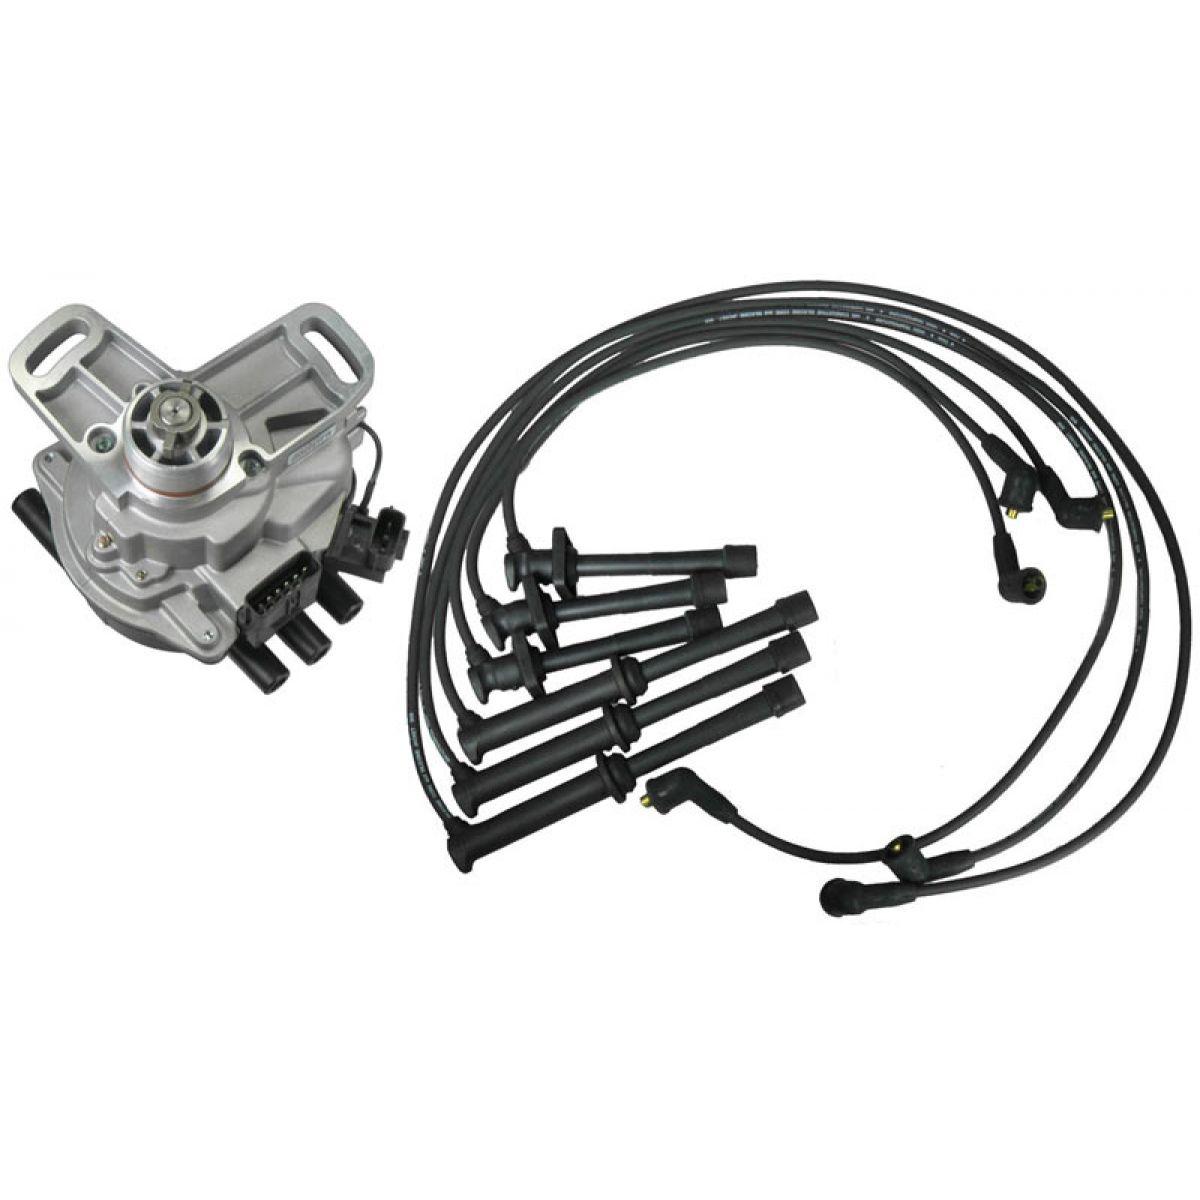 Distributor Amp Wire Set For 93 94 Mazda 626 Mx 6 Ford Probe